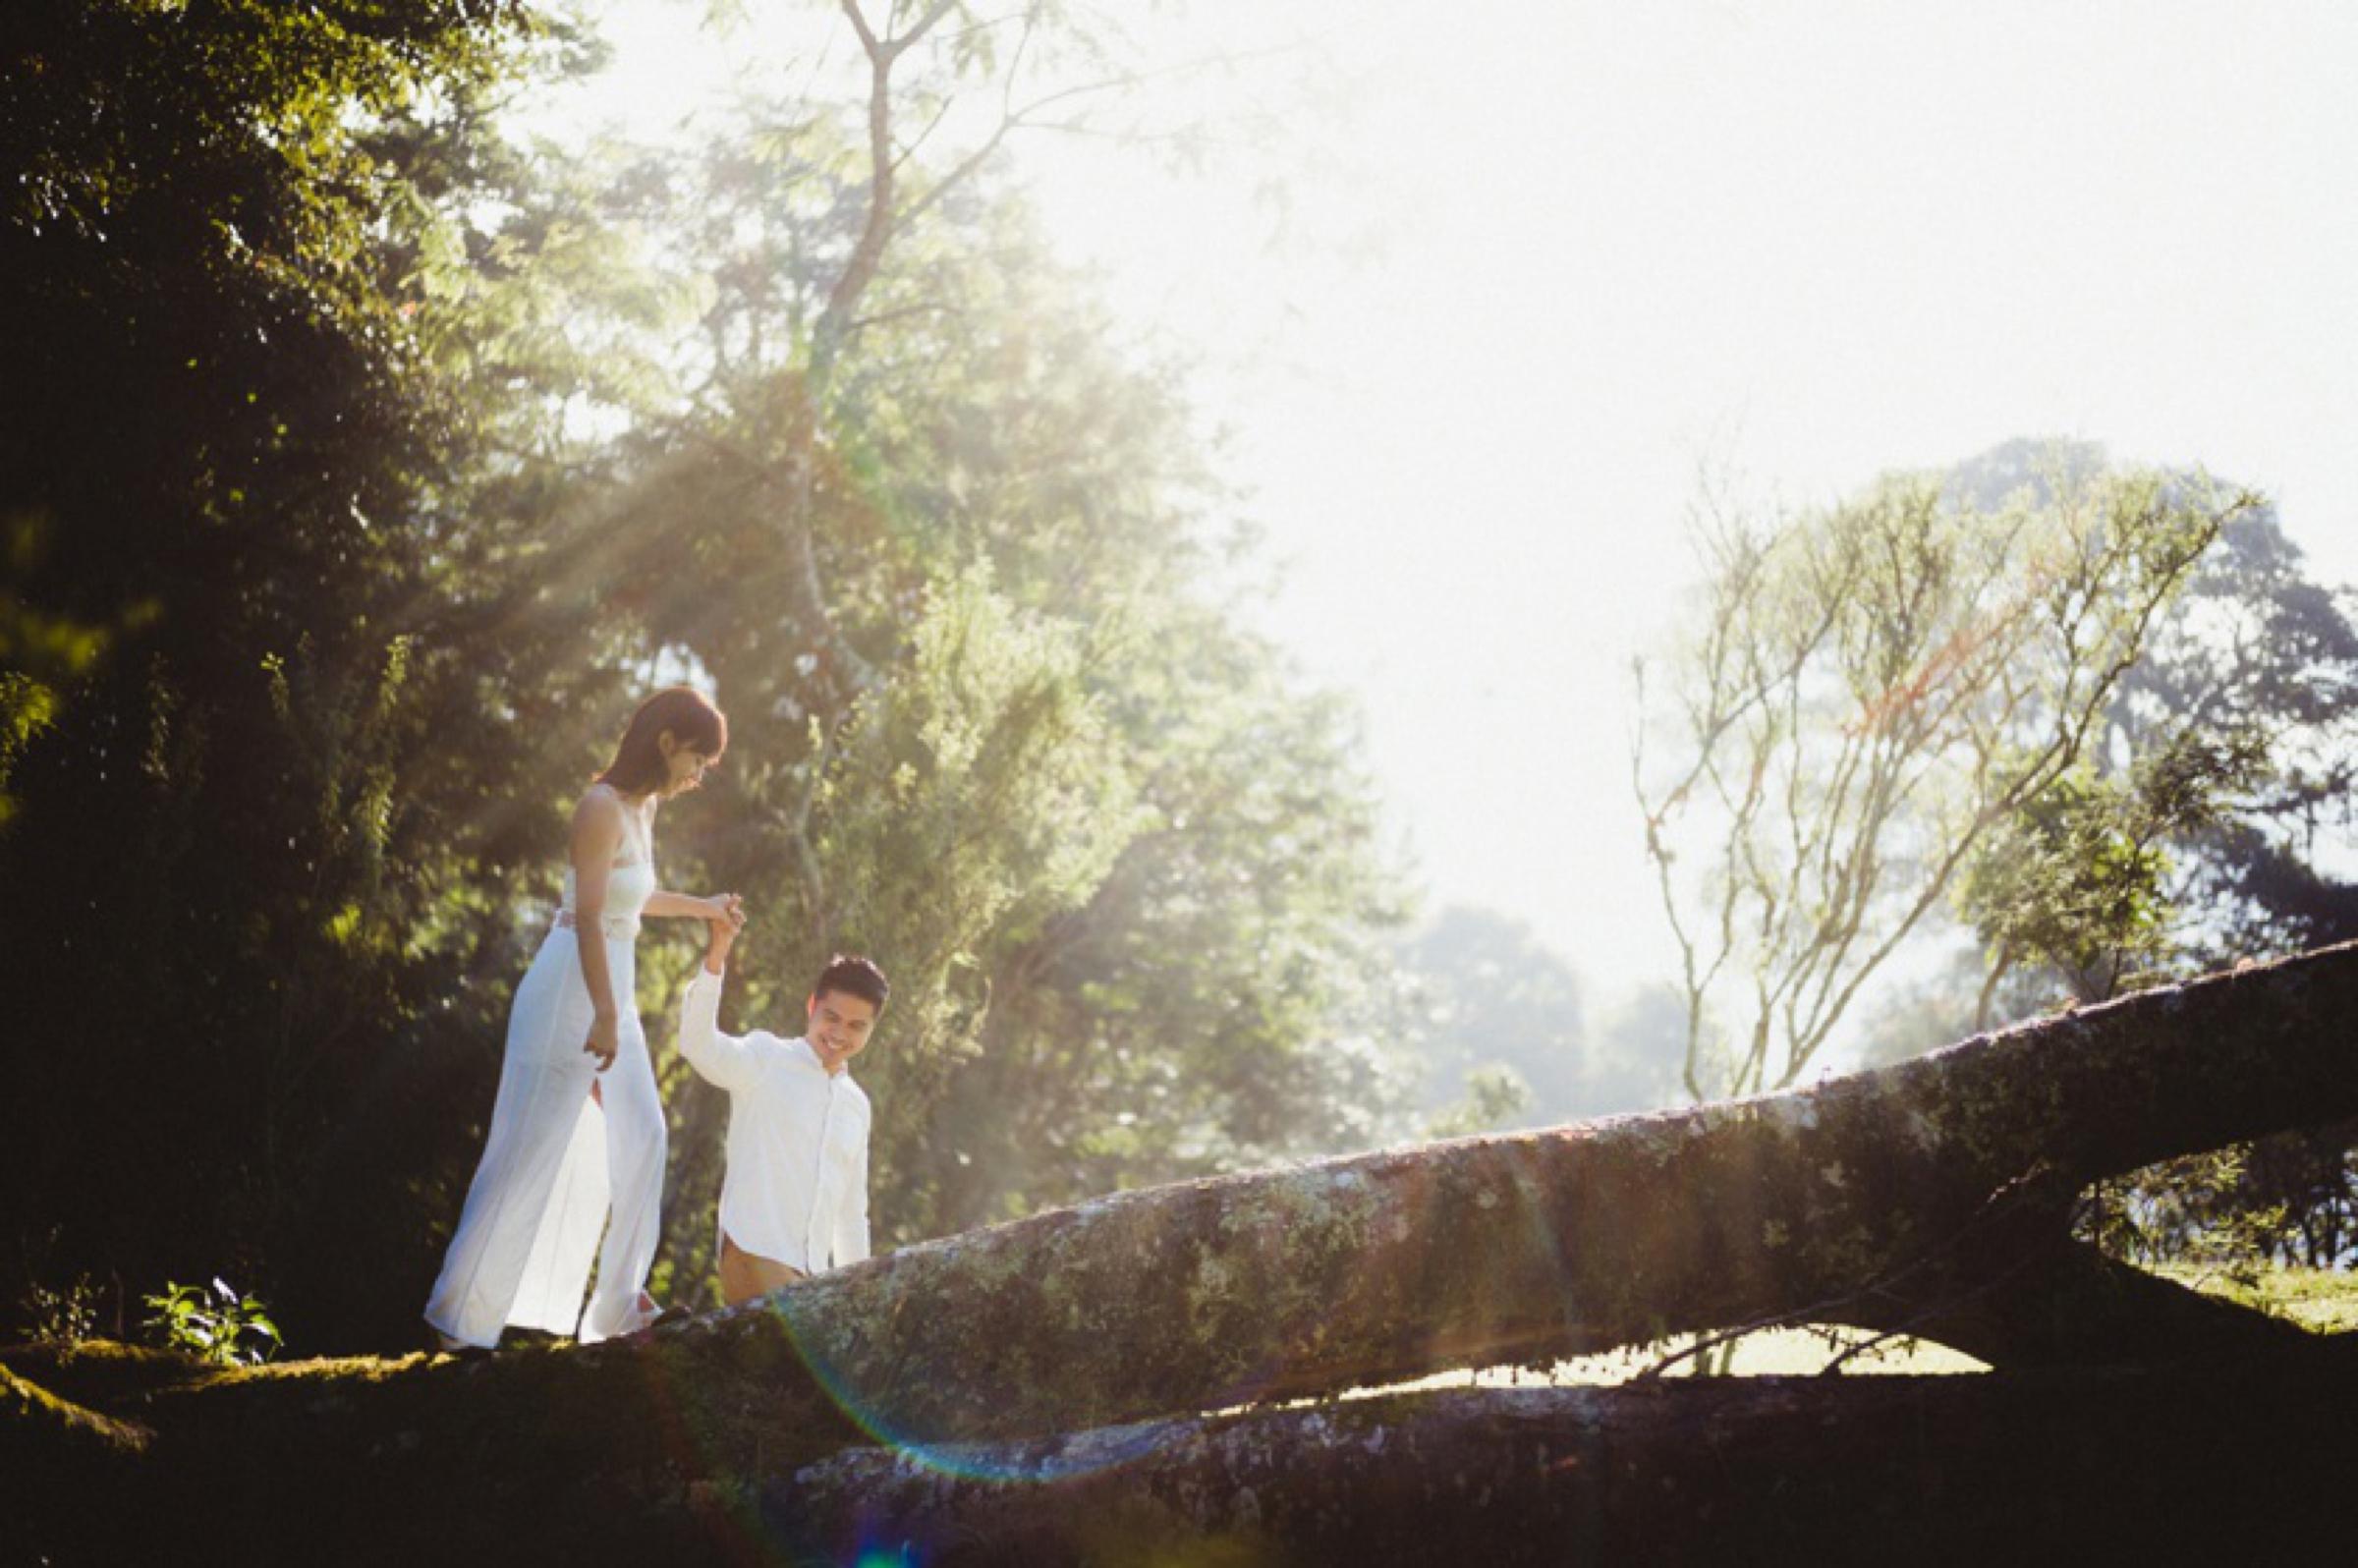 Surya-Chossy-Bali-Prewedding-Pyara-Photo-Evans 39.jpg